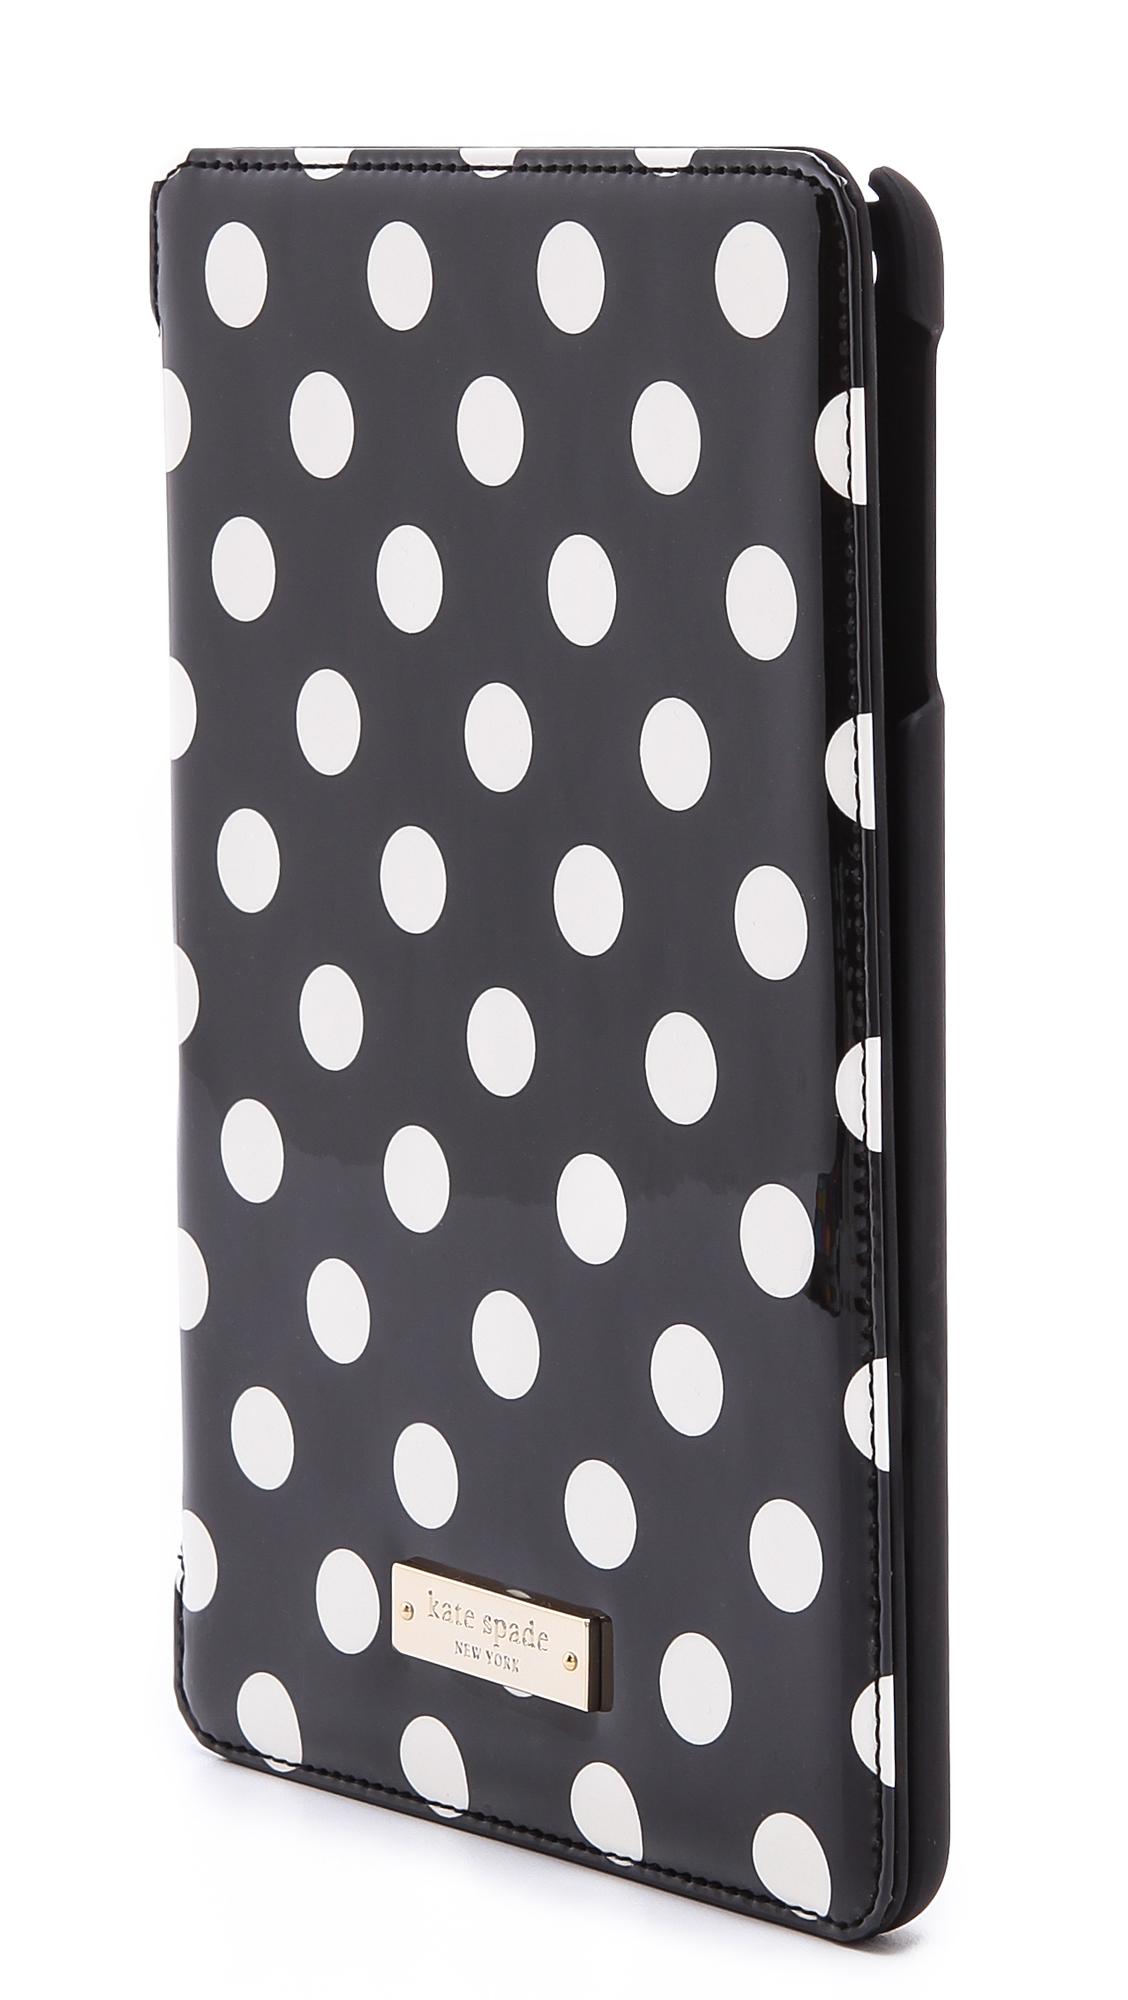 quality design 54b46 b6139 Kate Spade New York Le Pavillion iPad Mini Hard Case | SHOPBOP